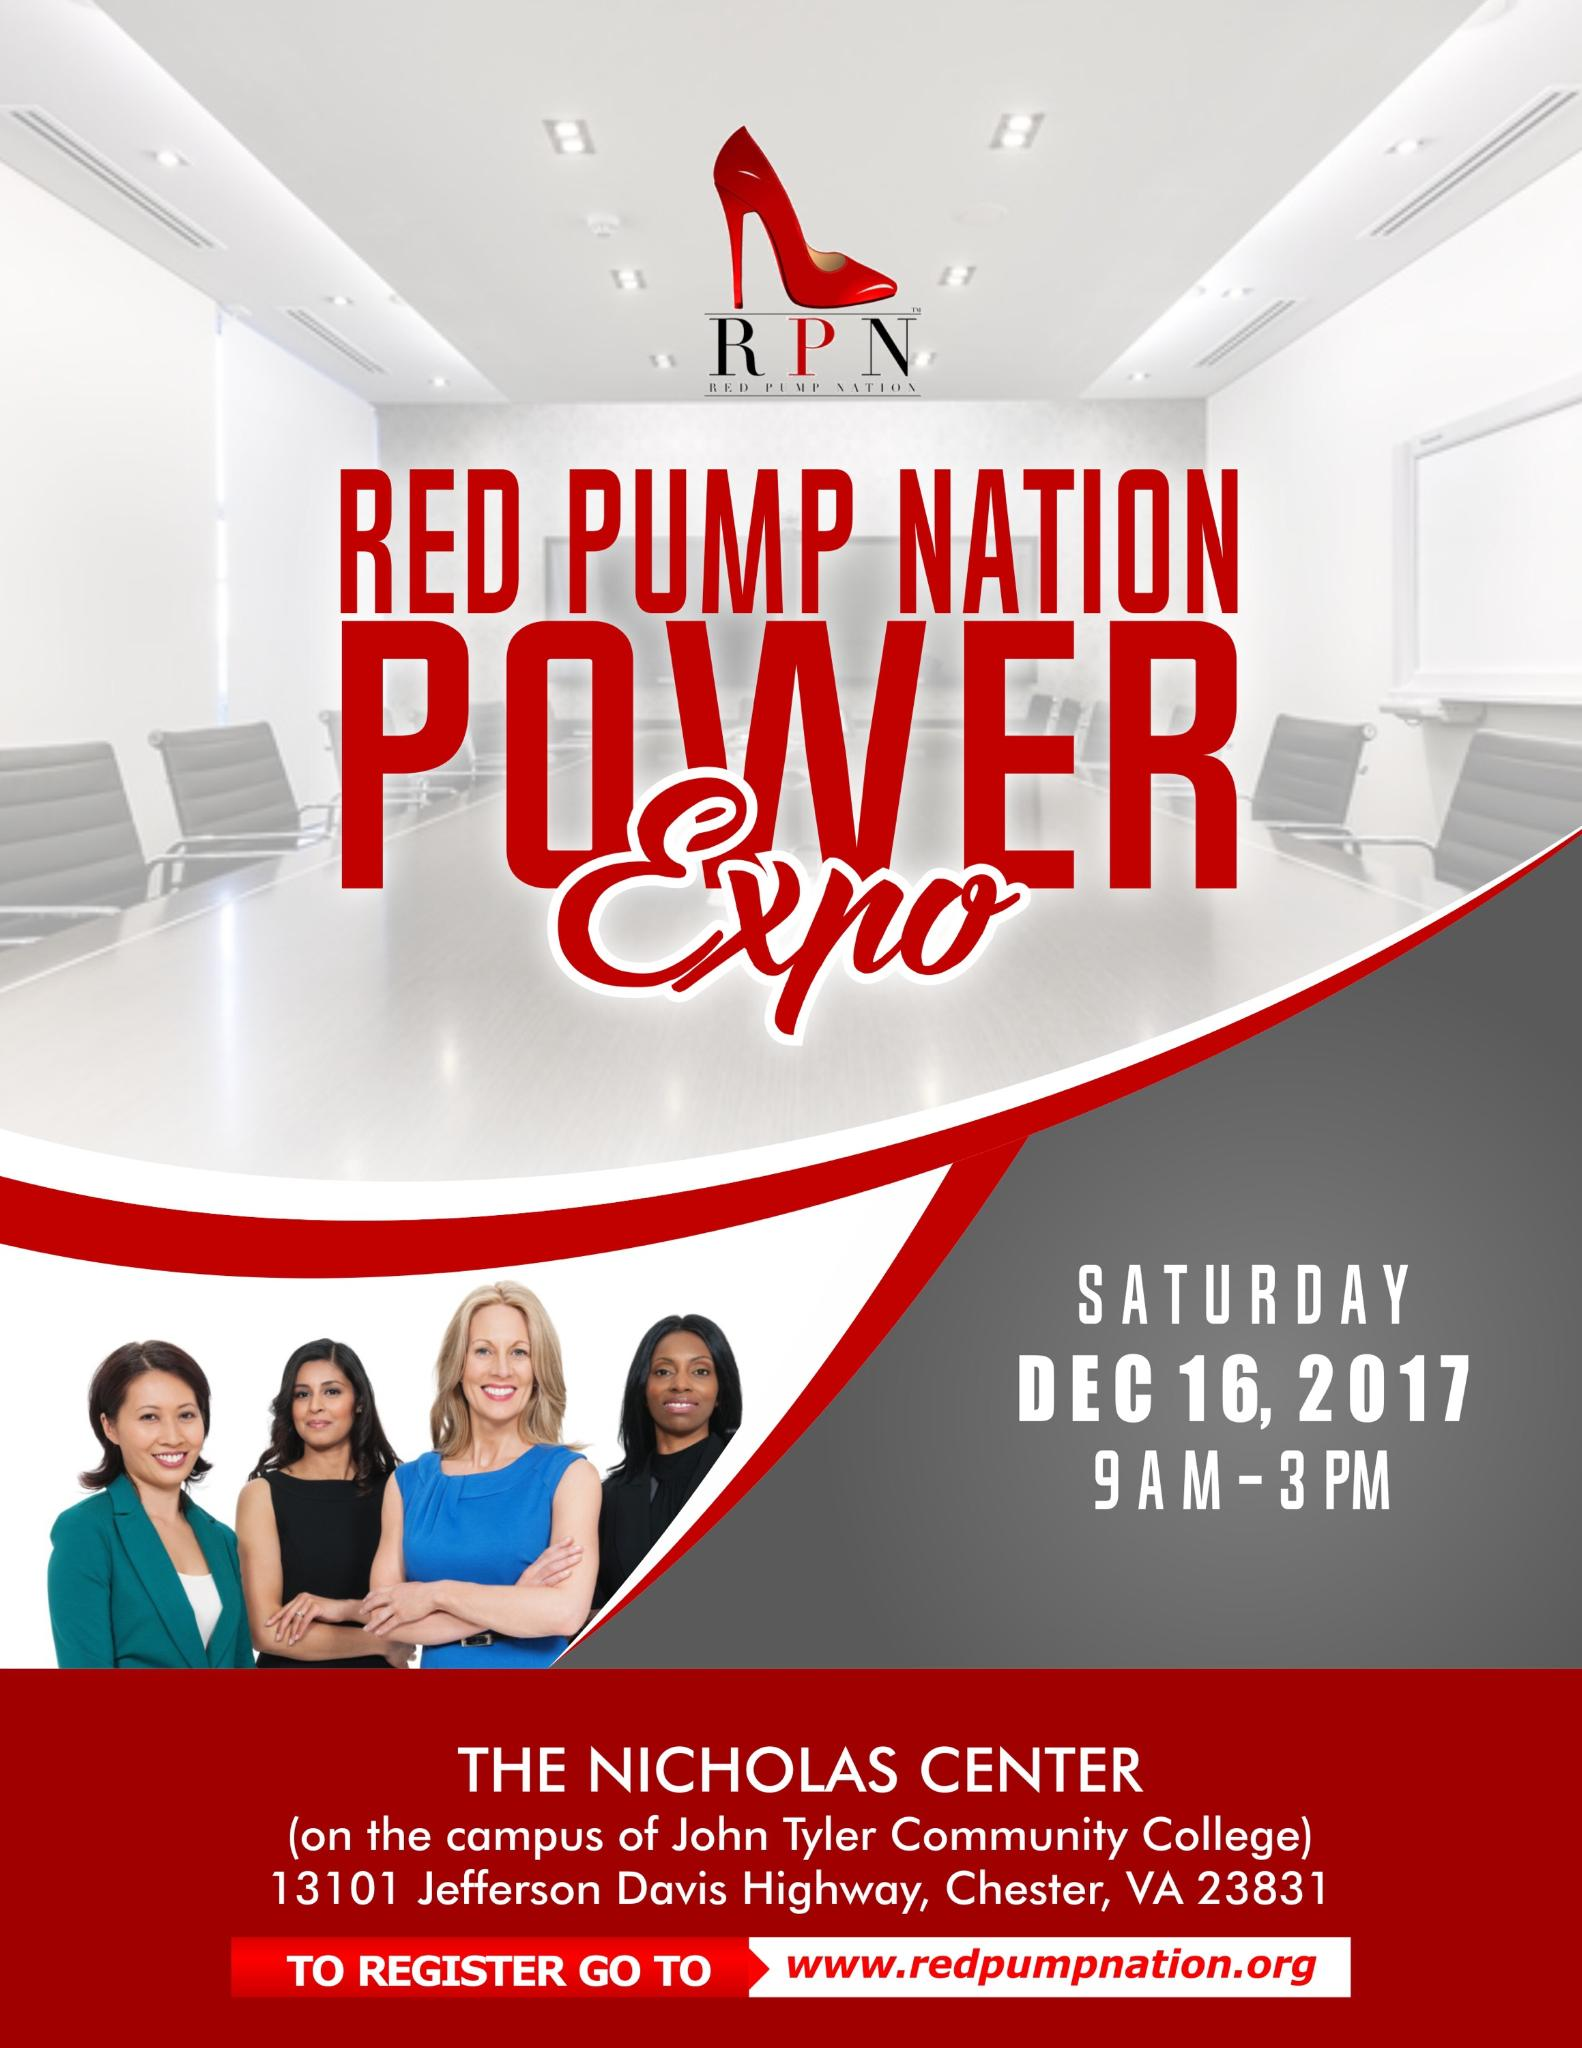 Red Pump Nation